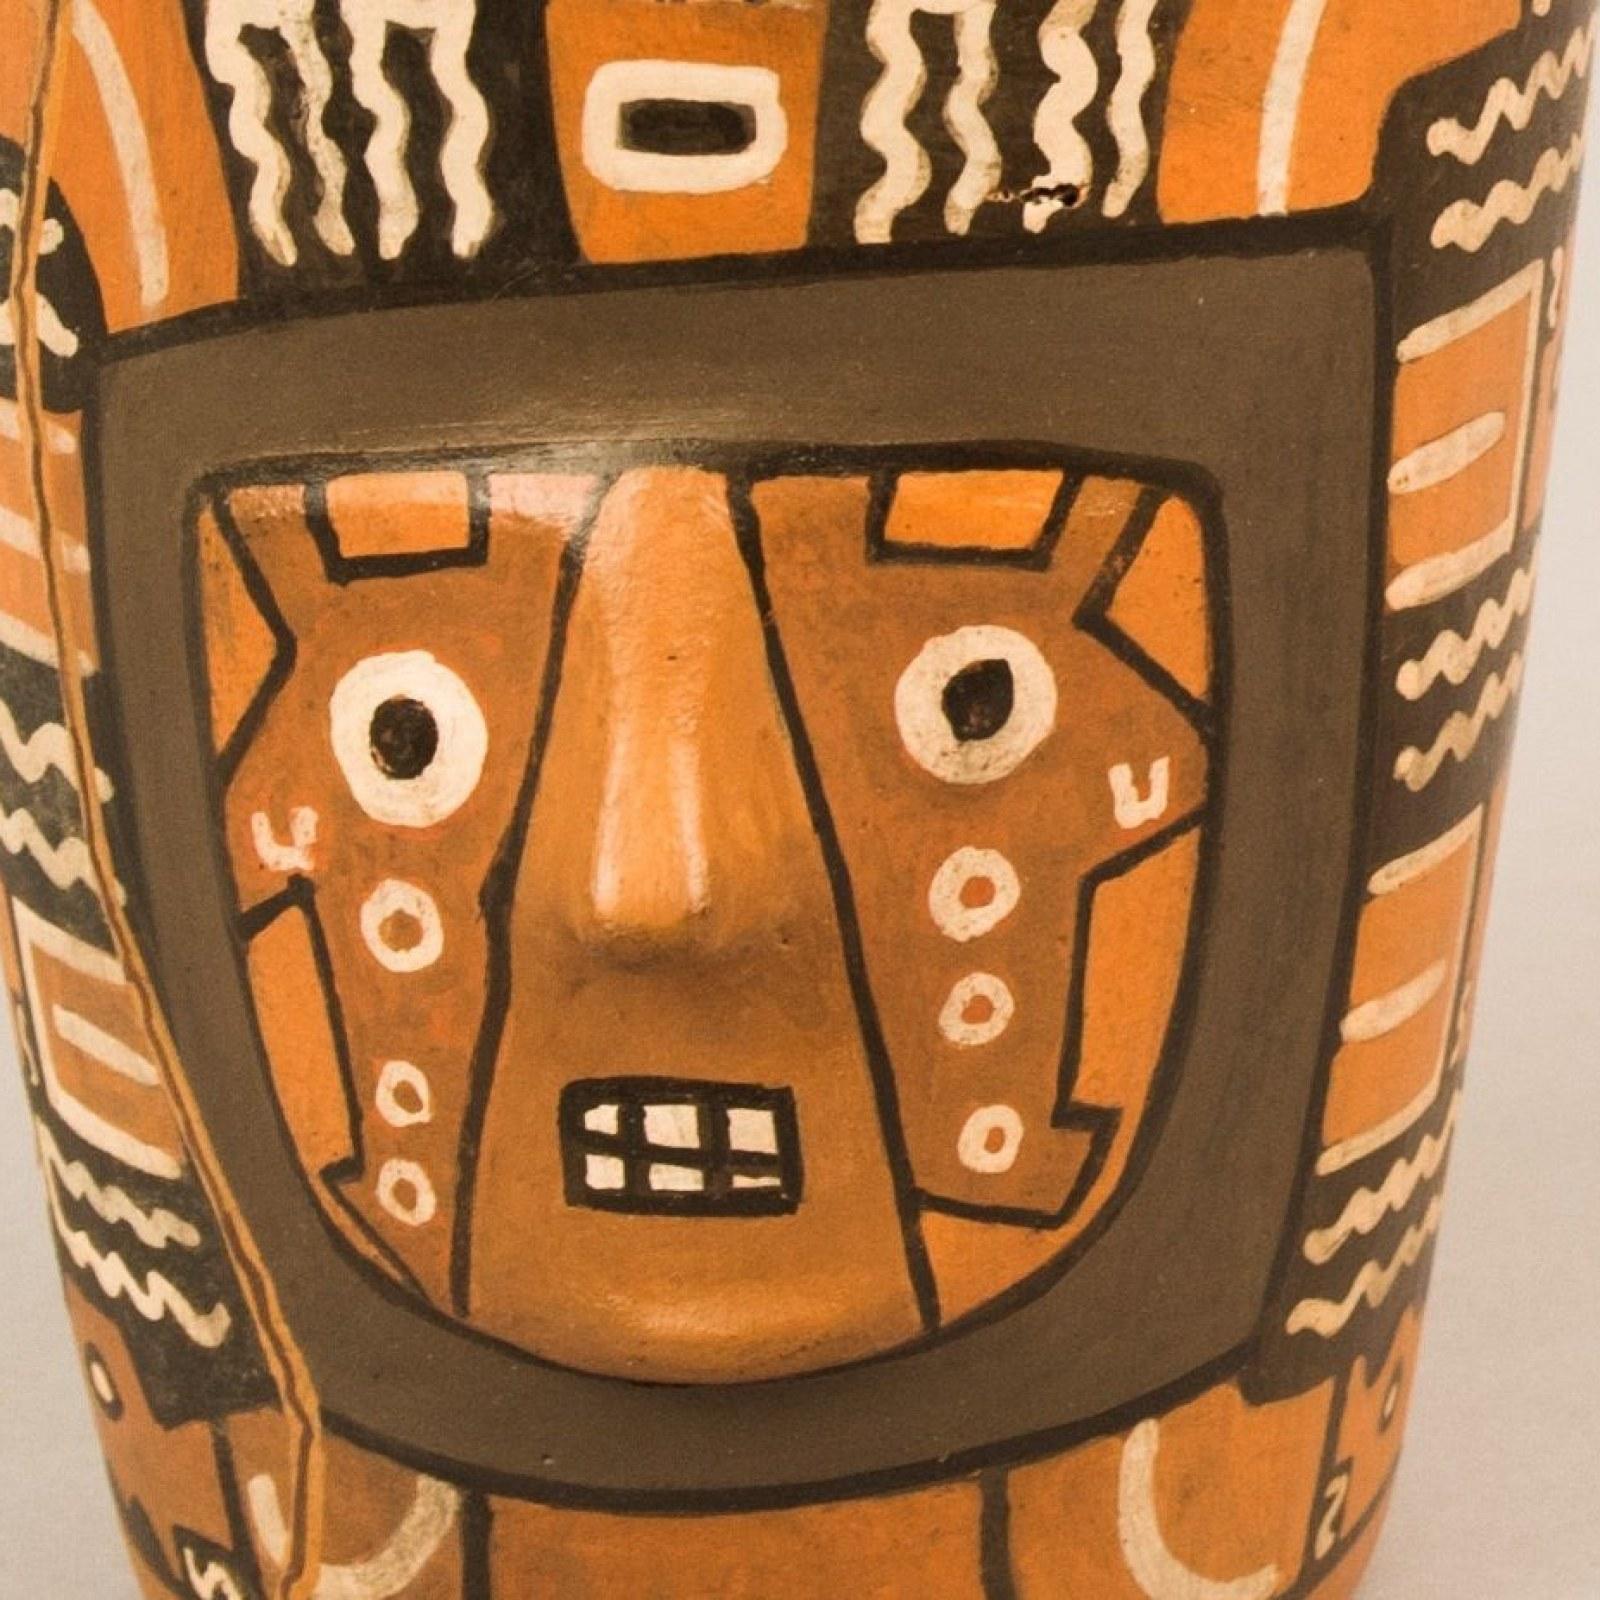 Drinking Potent Beer Held Ancient Peruvian Wari Society Together